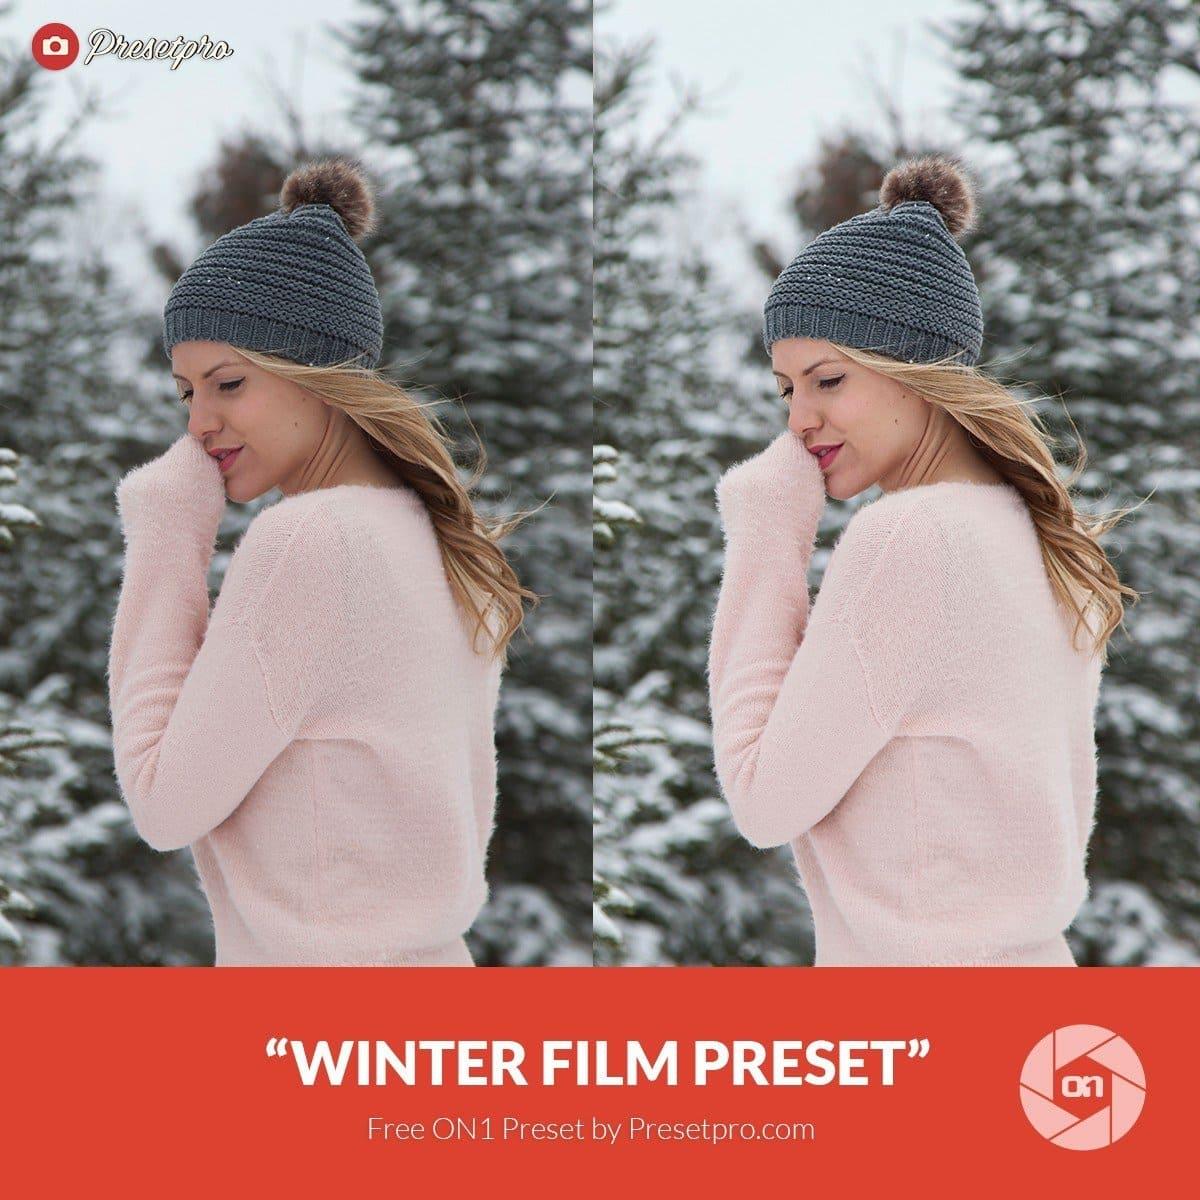 Free-On1-Preset-Winter-Film-Presetpro.com